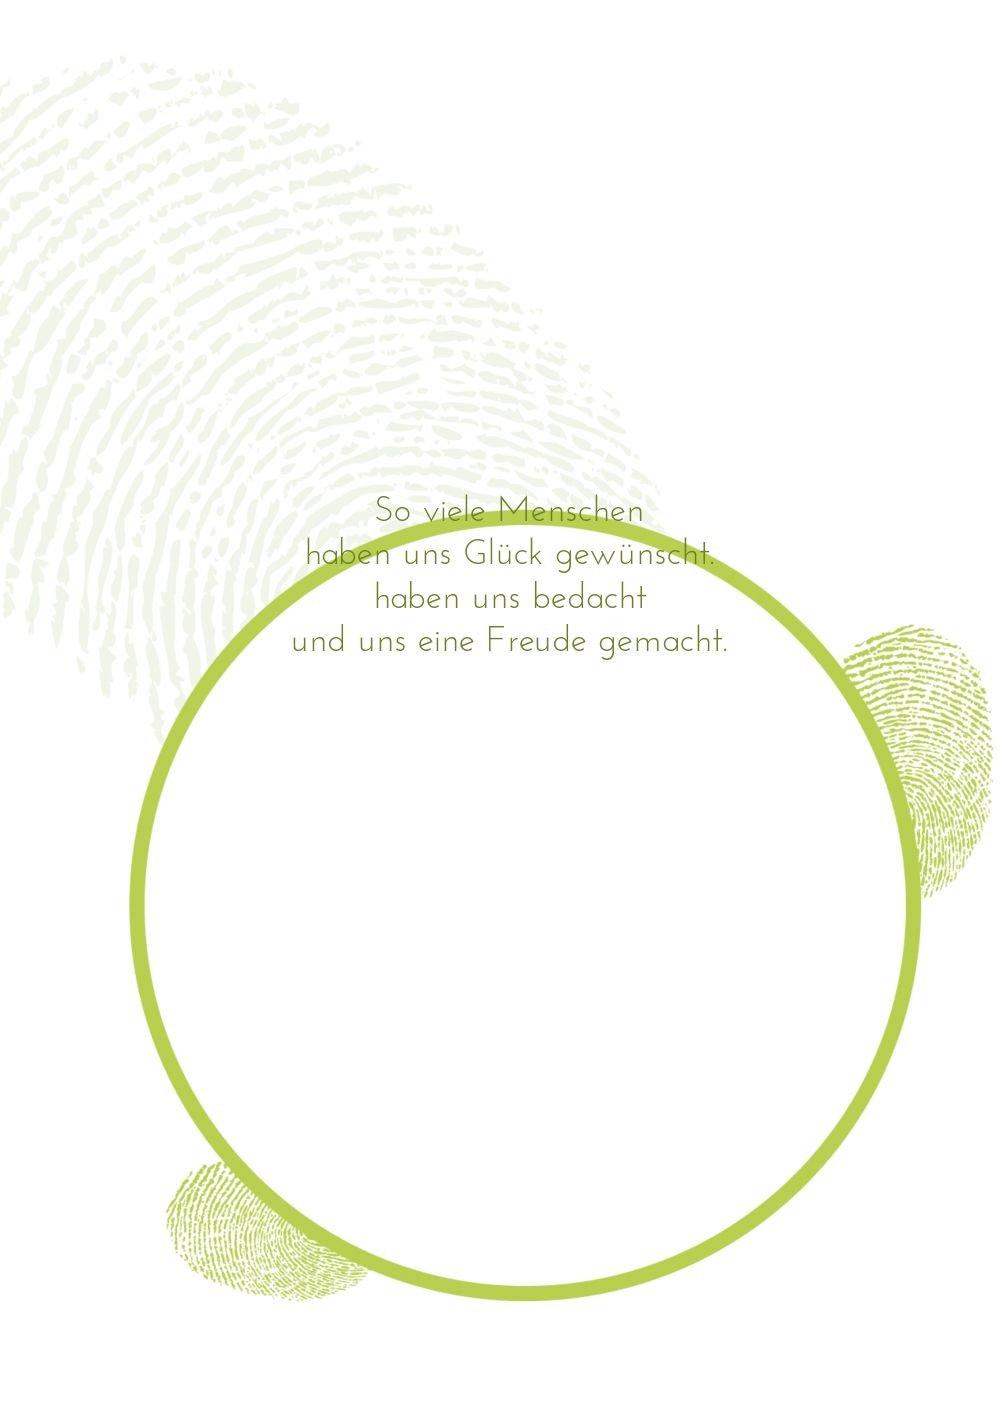 Kartenparadies Danksagung für Hochzeitsgeschenke Hochzeit Dankeskarte Dankeskarte Dankeskarte fingerprint, hochwertige Danksagungskarte Hochzeitsglückwünsche inklusive Umschläge   20 Karten - (Format  105x148 mm) Farbe  RosaLila B01N7ULJ5O | Attraktive Mode  32daf0